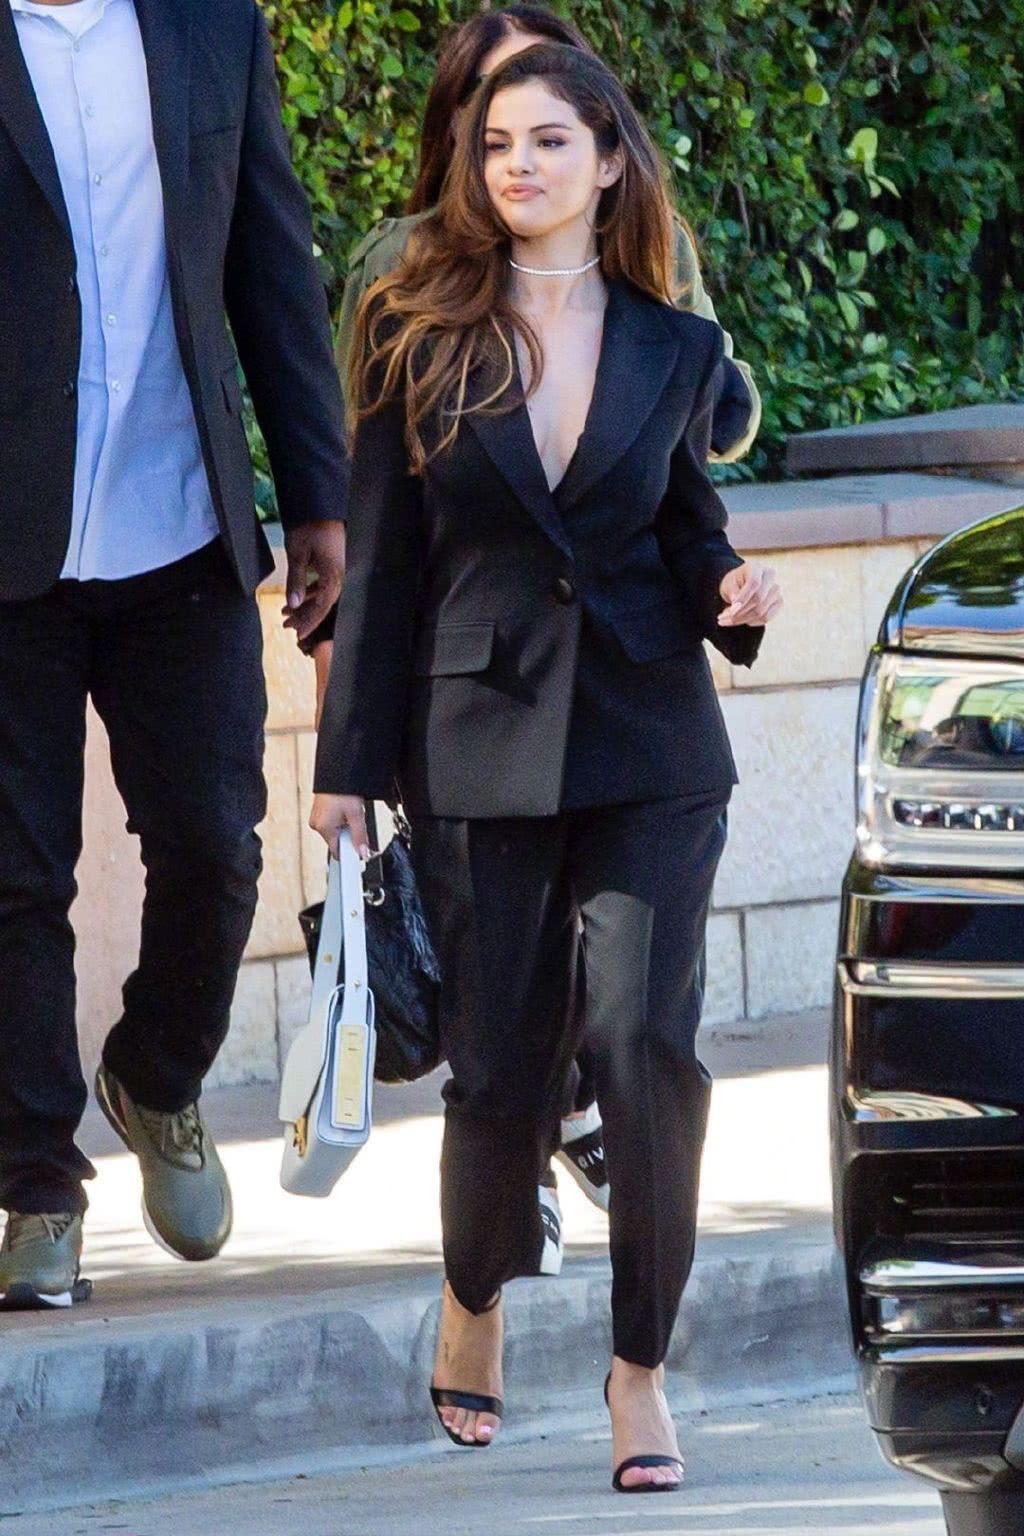 <b>赛琳娜戈麦斯穿黑色西装配黑色休闲裤现身通勤风打扮时尚精致</b>